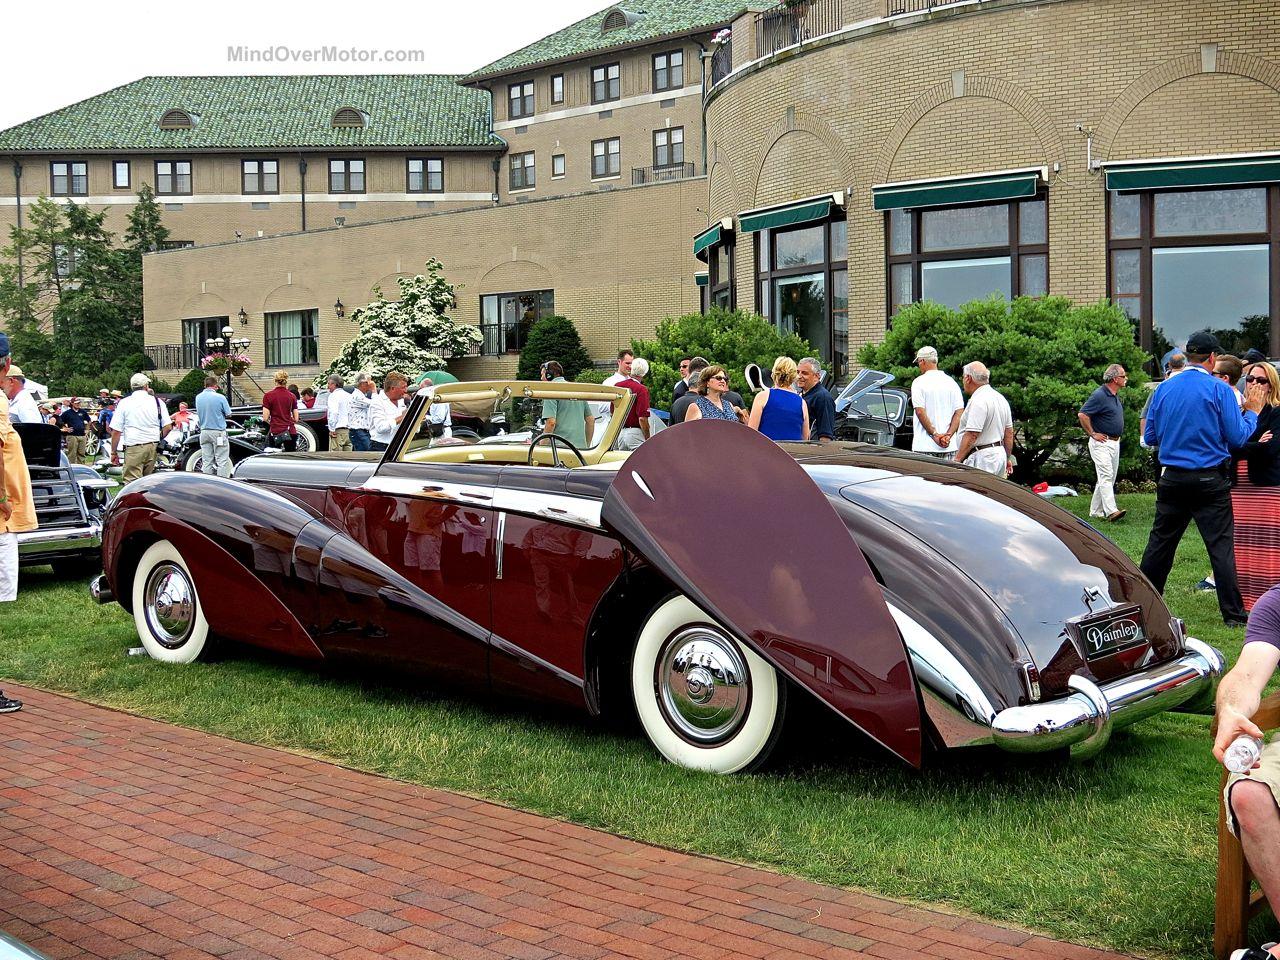 Hershey Elegance Daimler